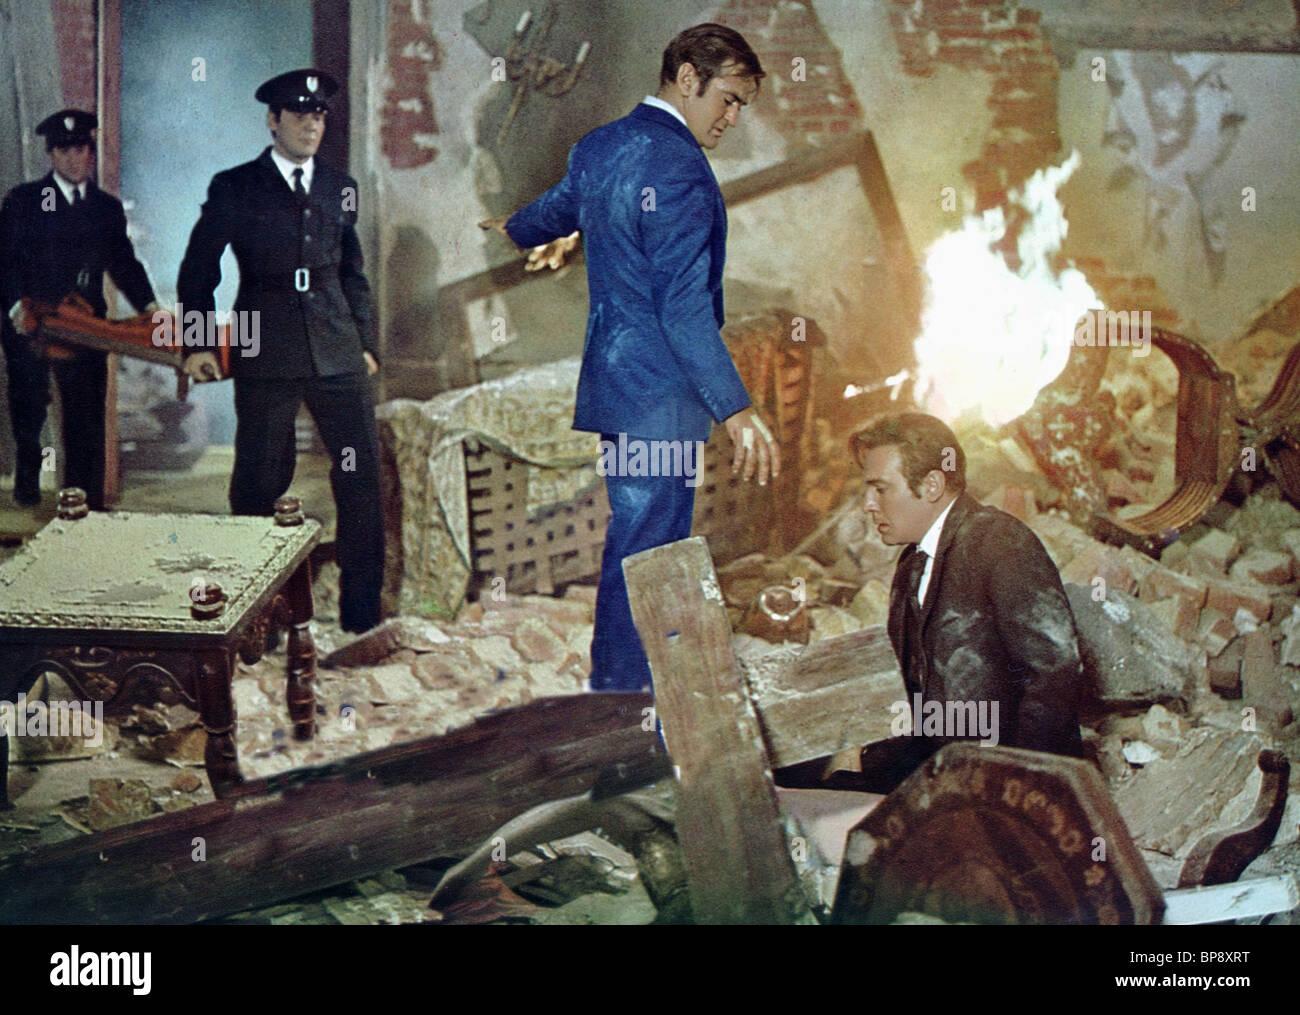 ROD TAYLOR & CHRISTOPHER PLUMMER NOBODY RUNS FOREVER; THE HIGH COMMISSIONER (1968) - Stock Image